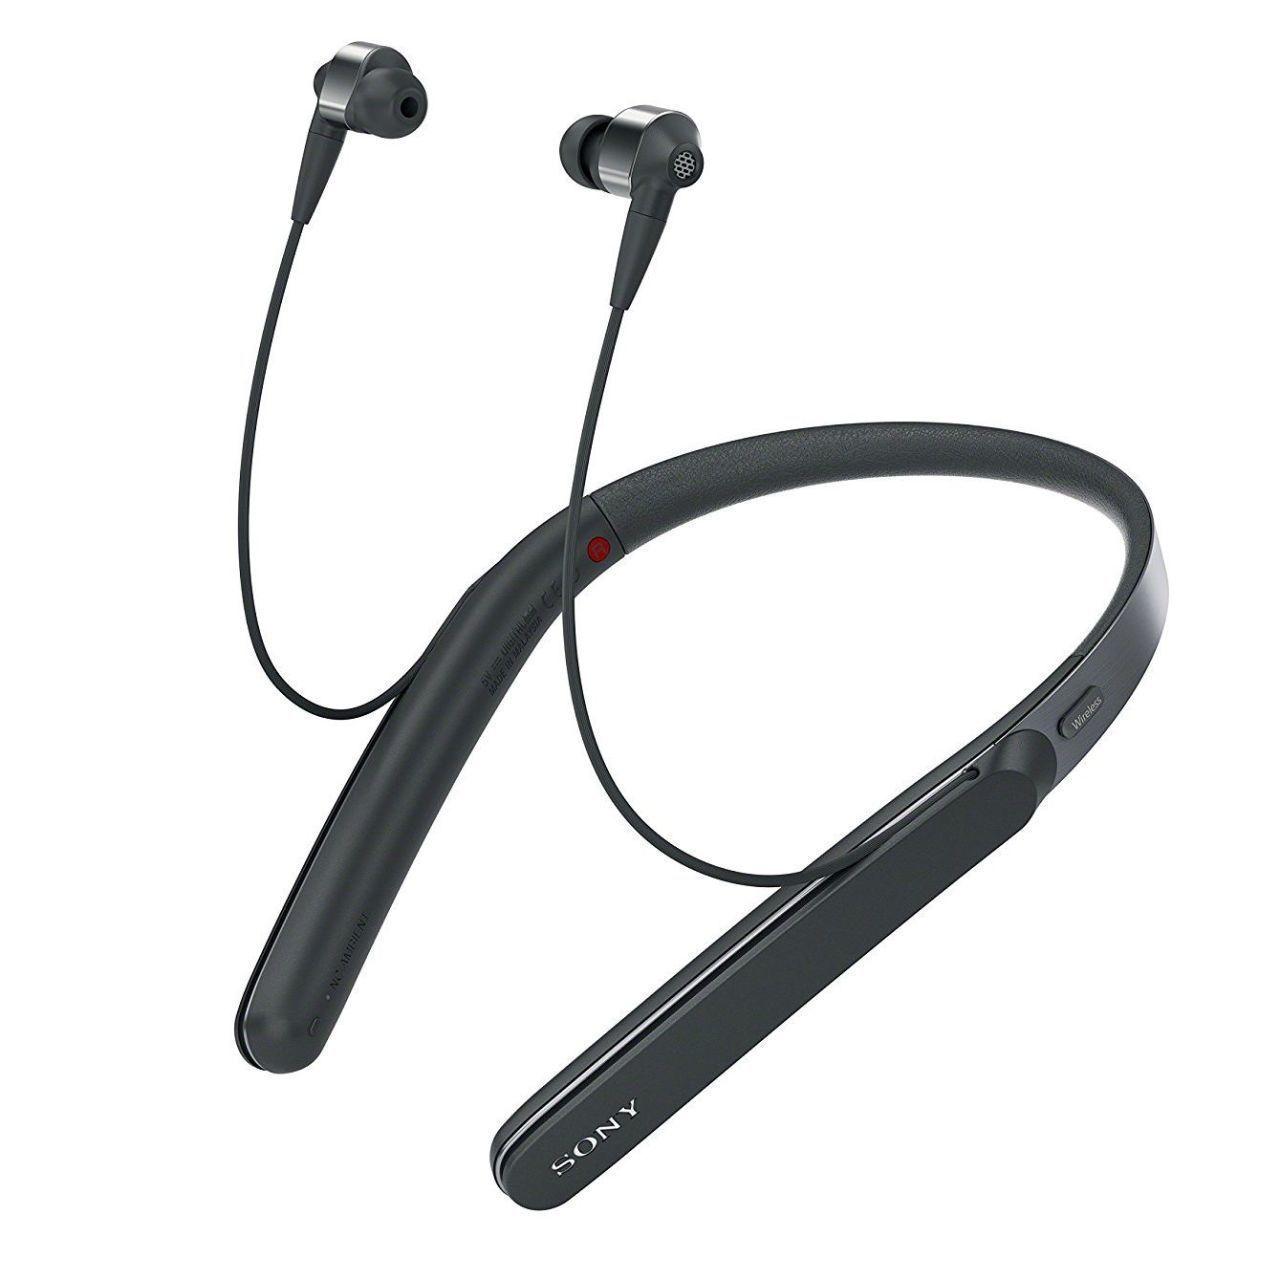 Sony WI-1000X Wireless Noise-Canceling Earbuds